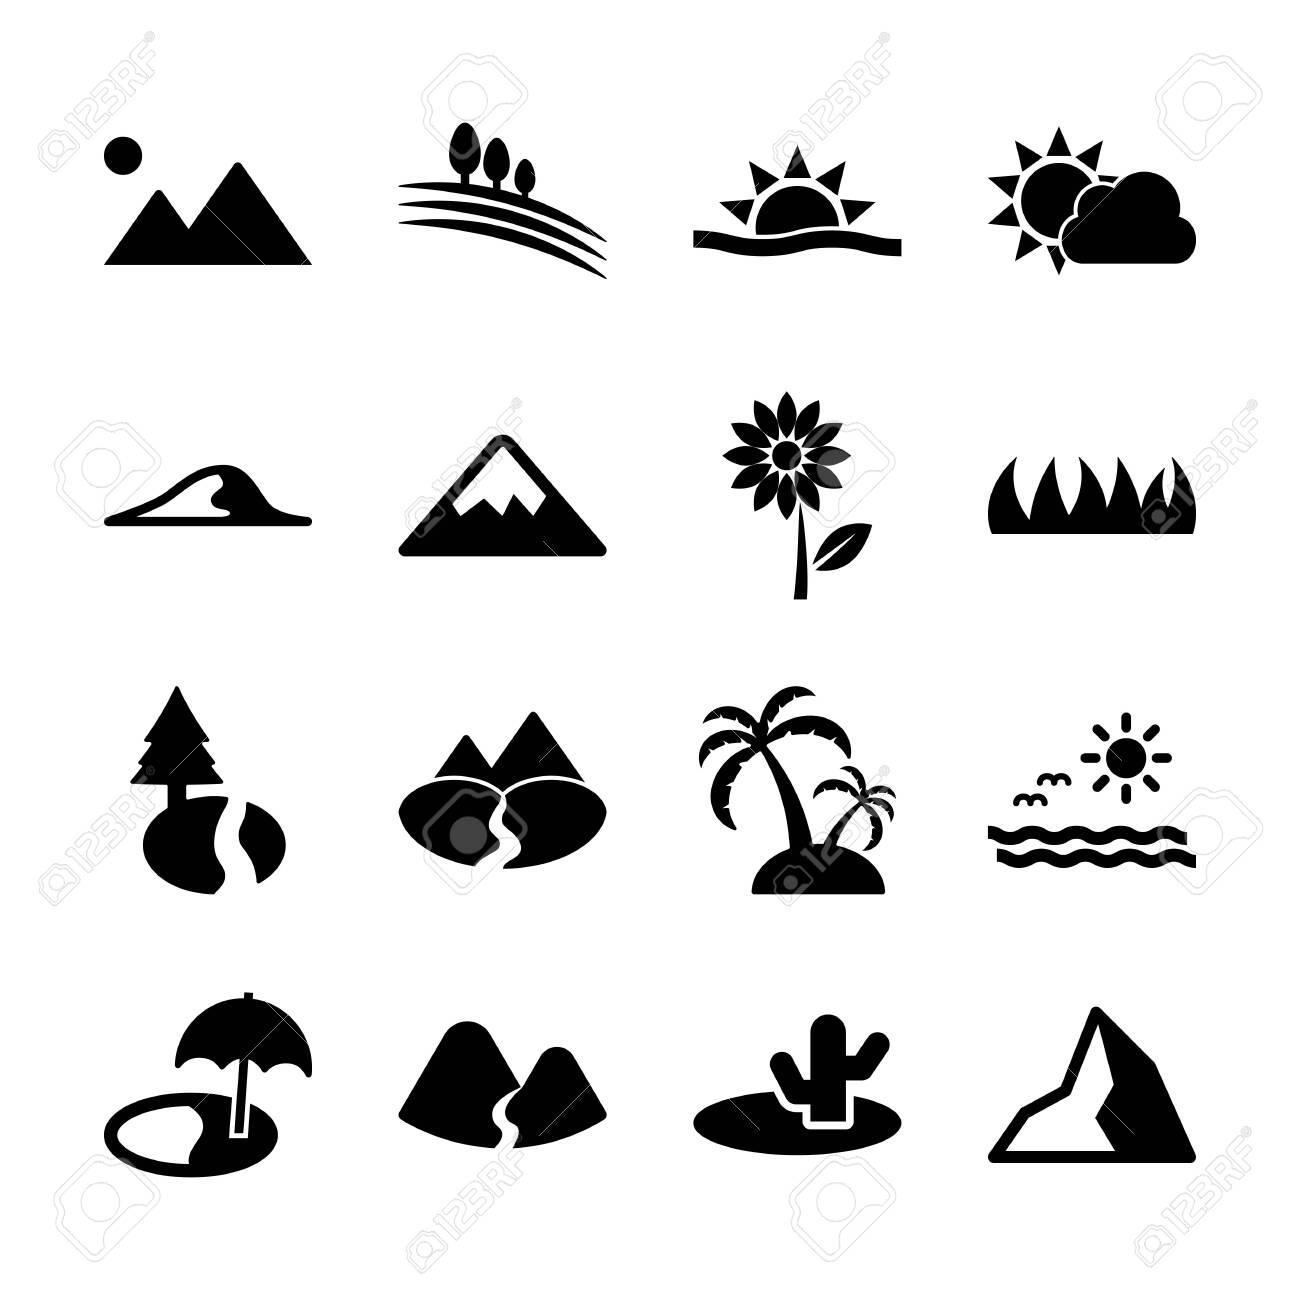 landscape solid icons vector design - 130042618